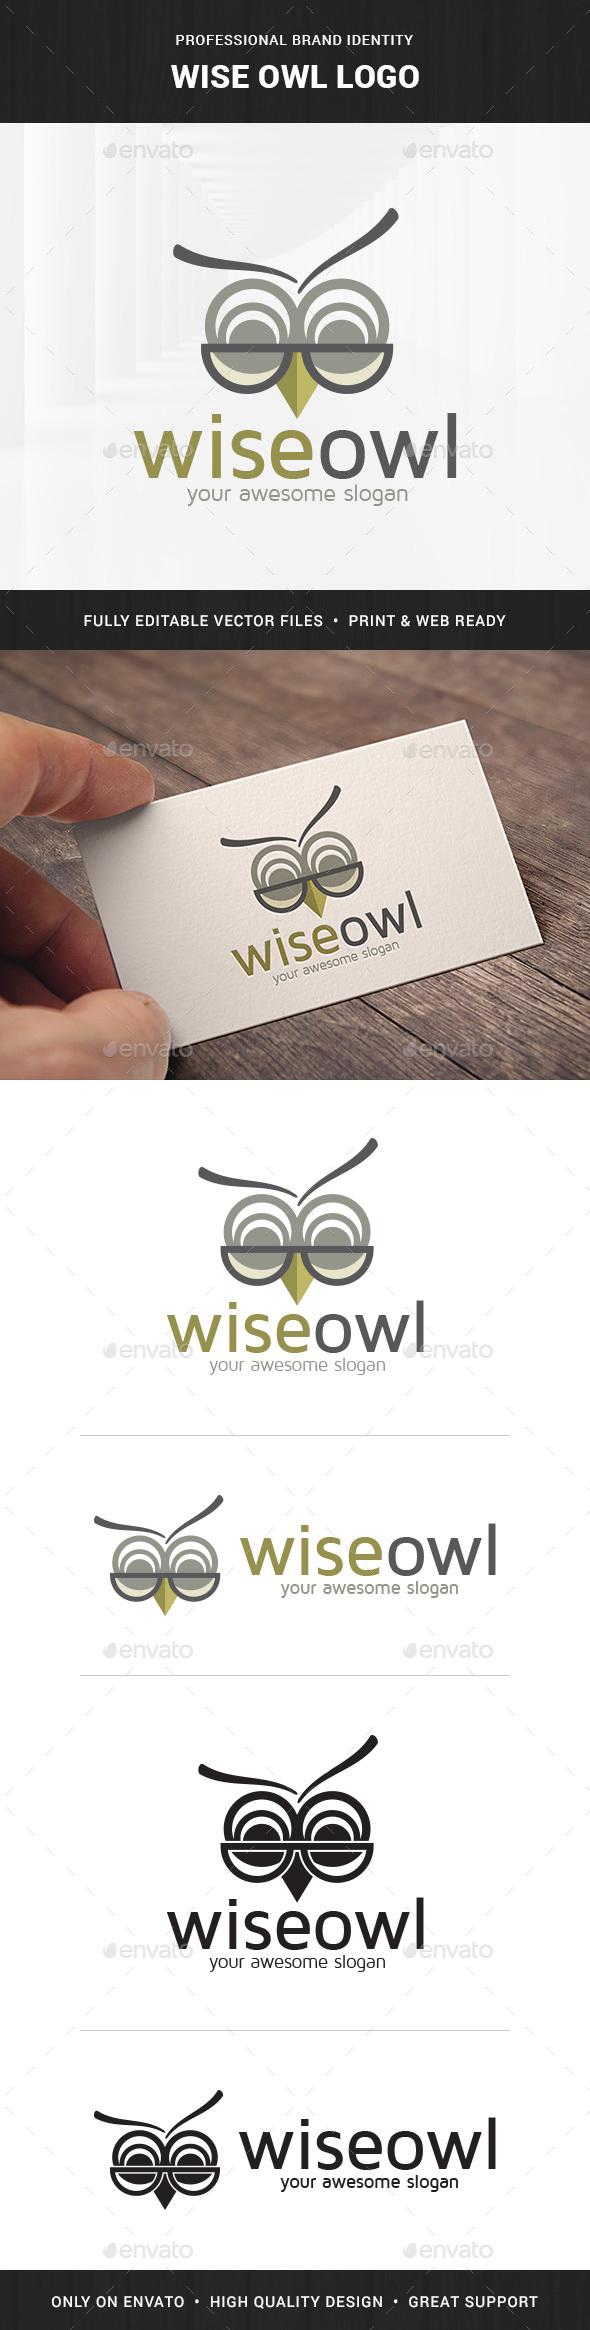 Wise Owl Logo Template - Animals Logo Templates